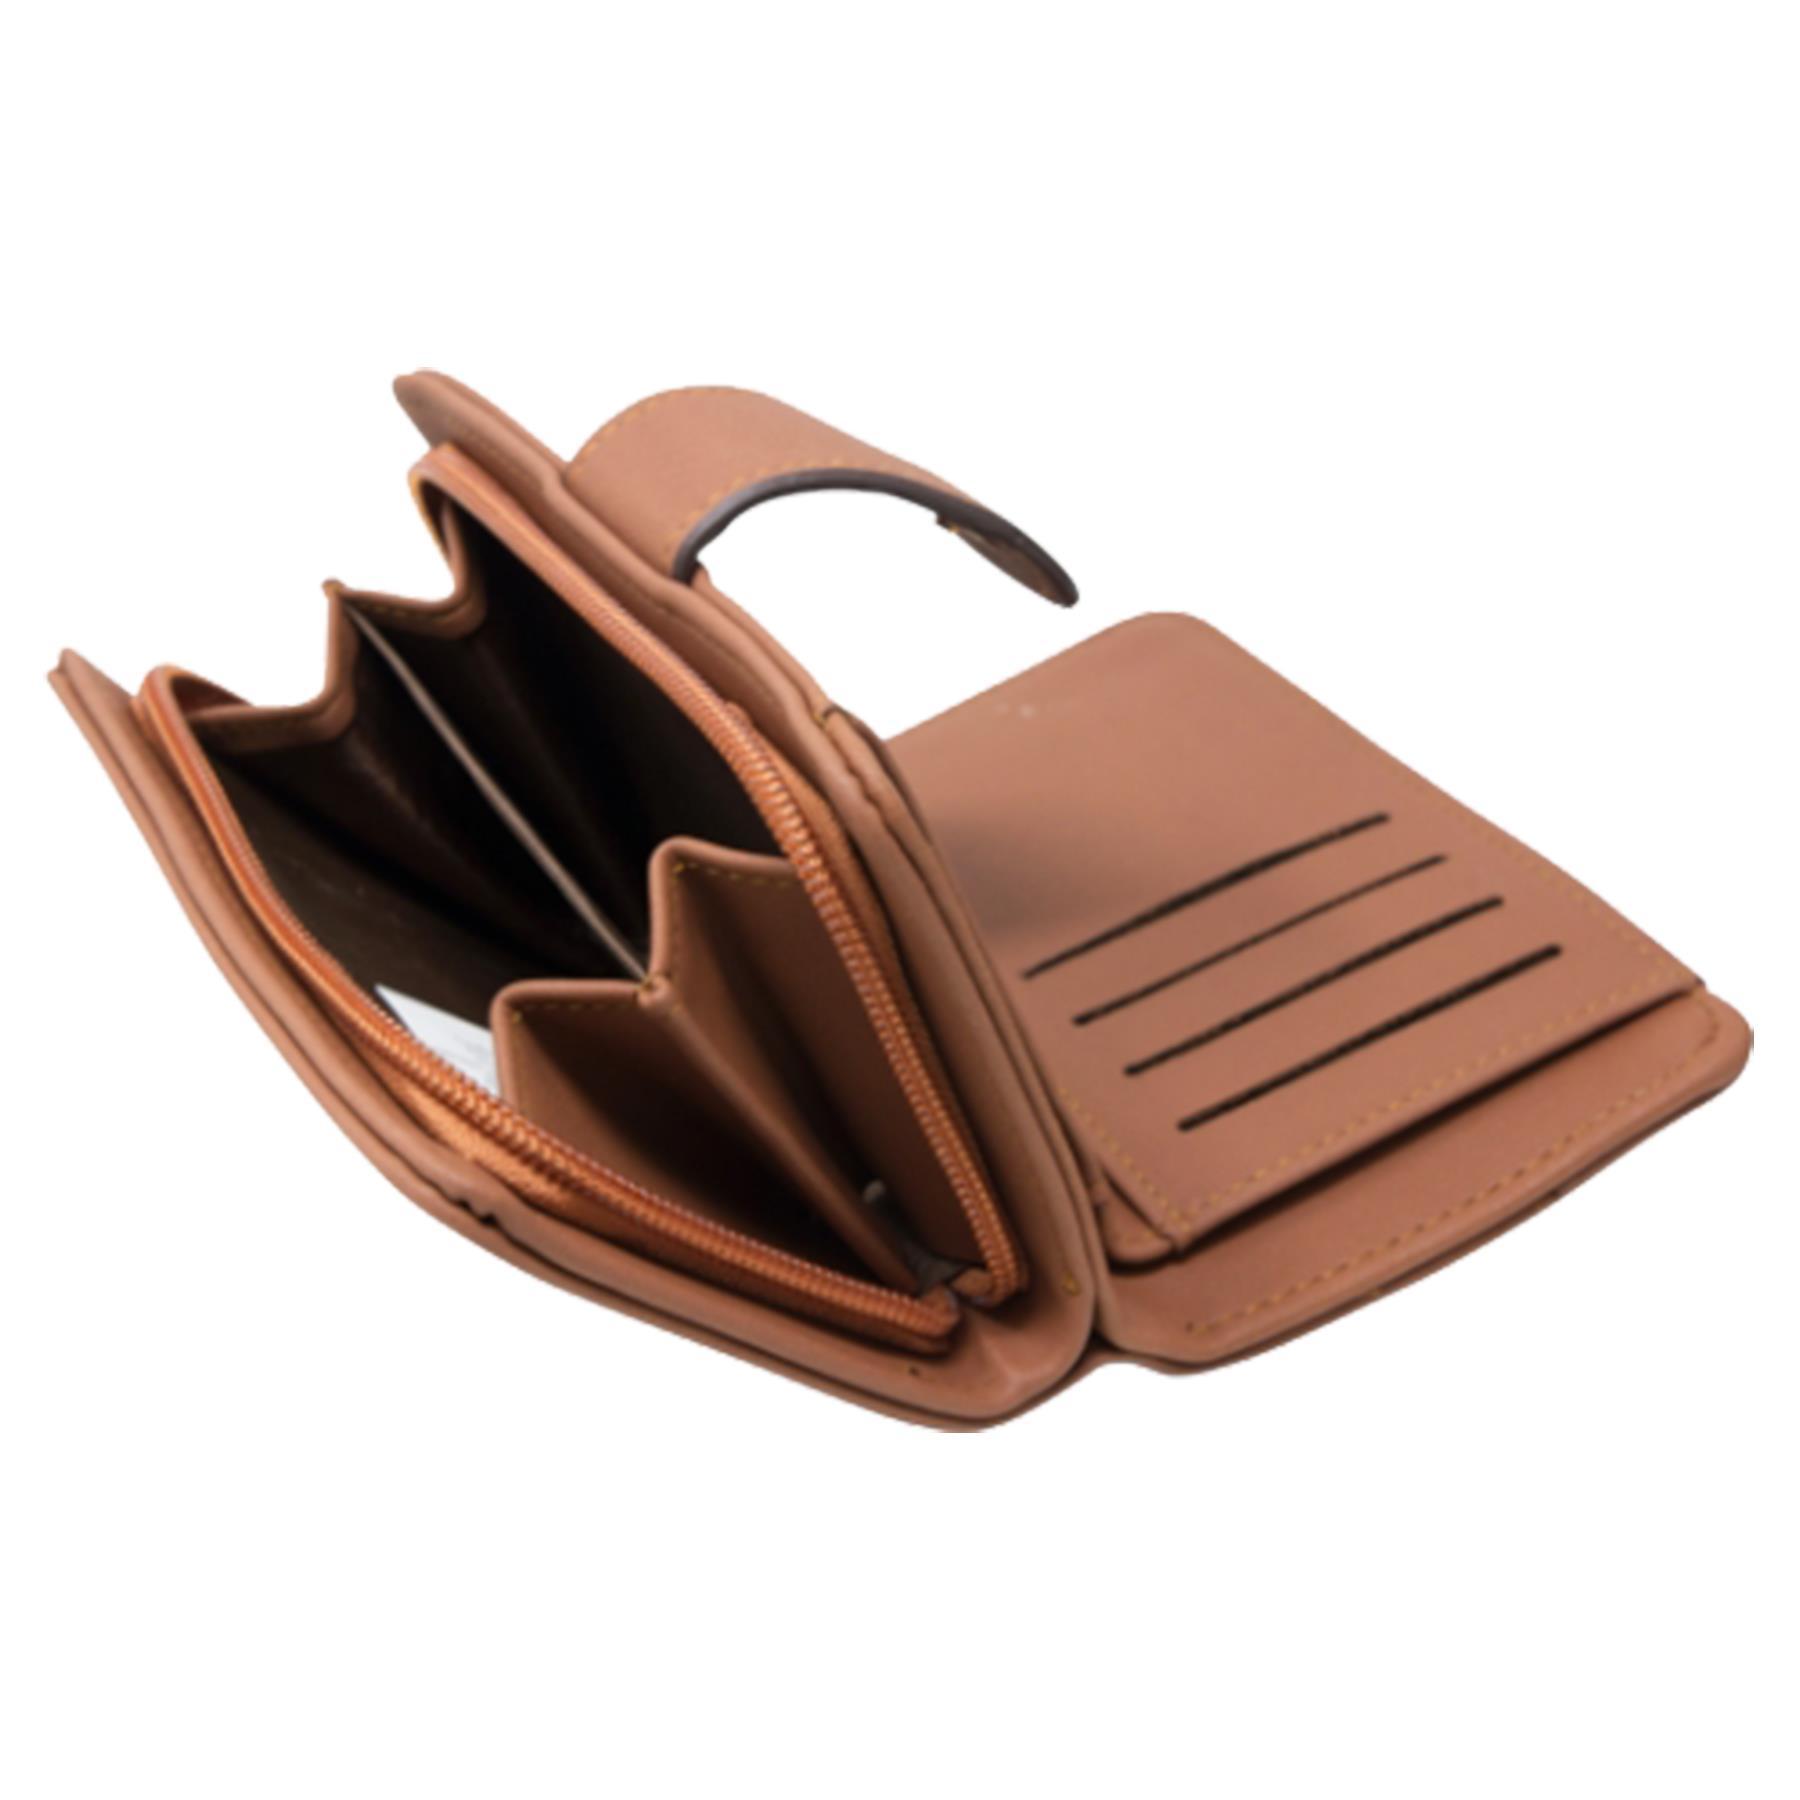 New-Ladies-Card-Slots-Zipped-Pocket-Faux-Leather-Basic-Wallet-Purse thumbnail 12